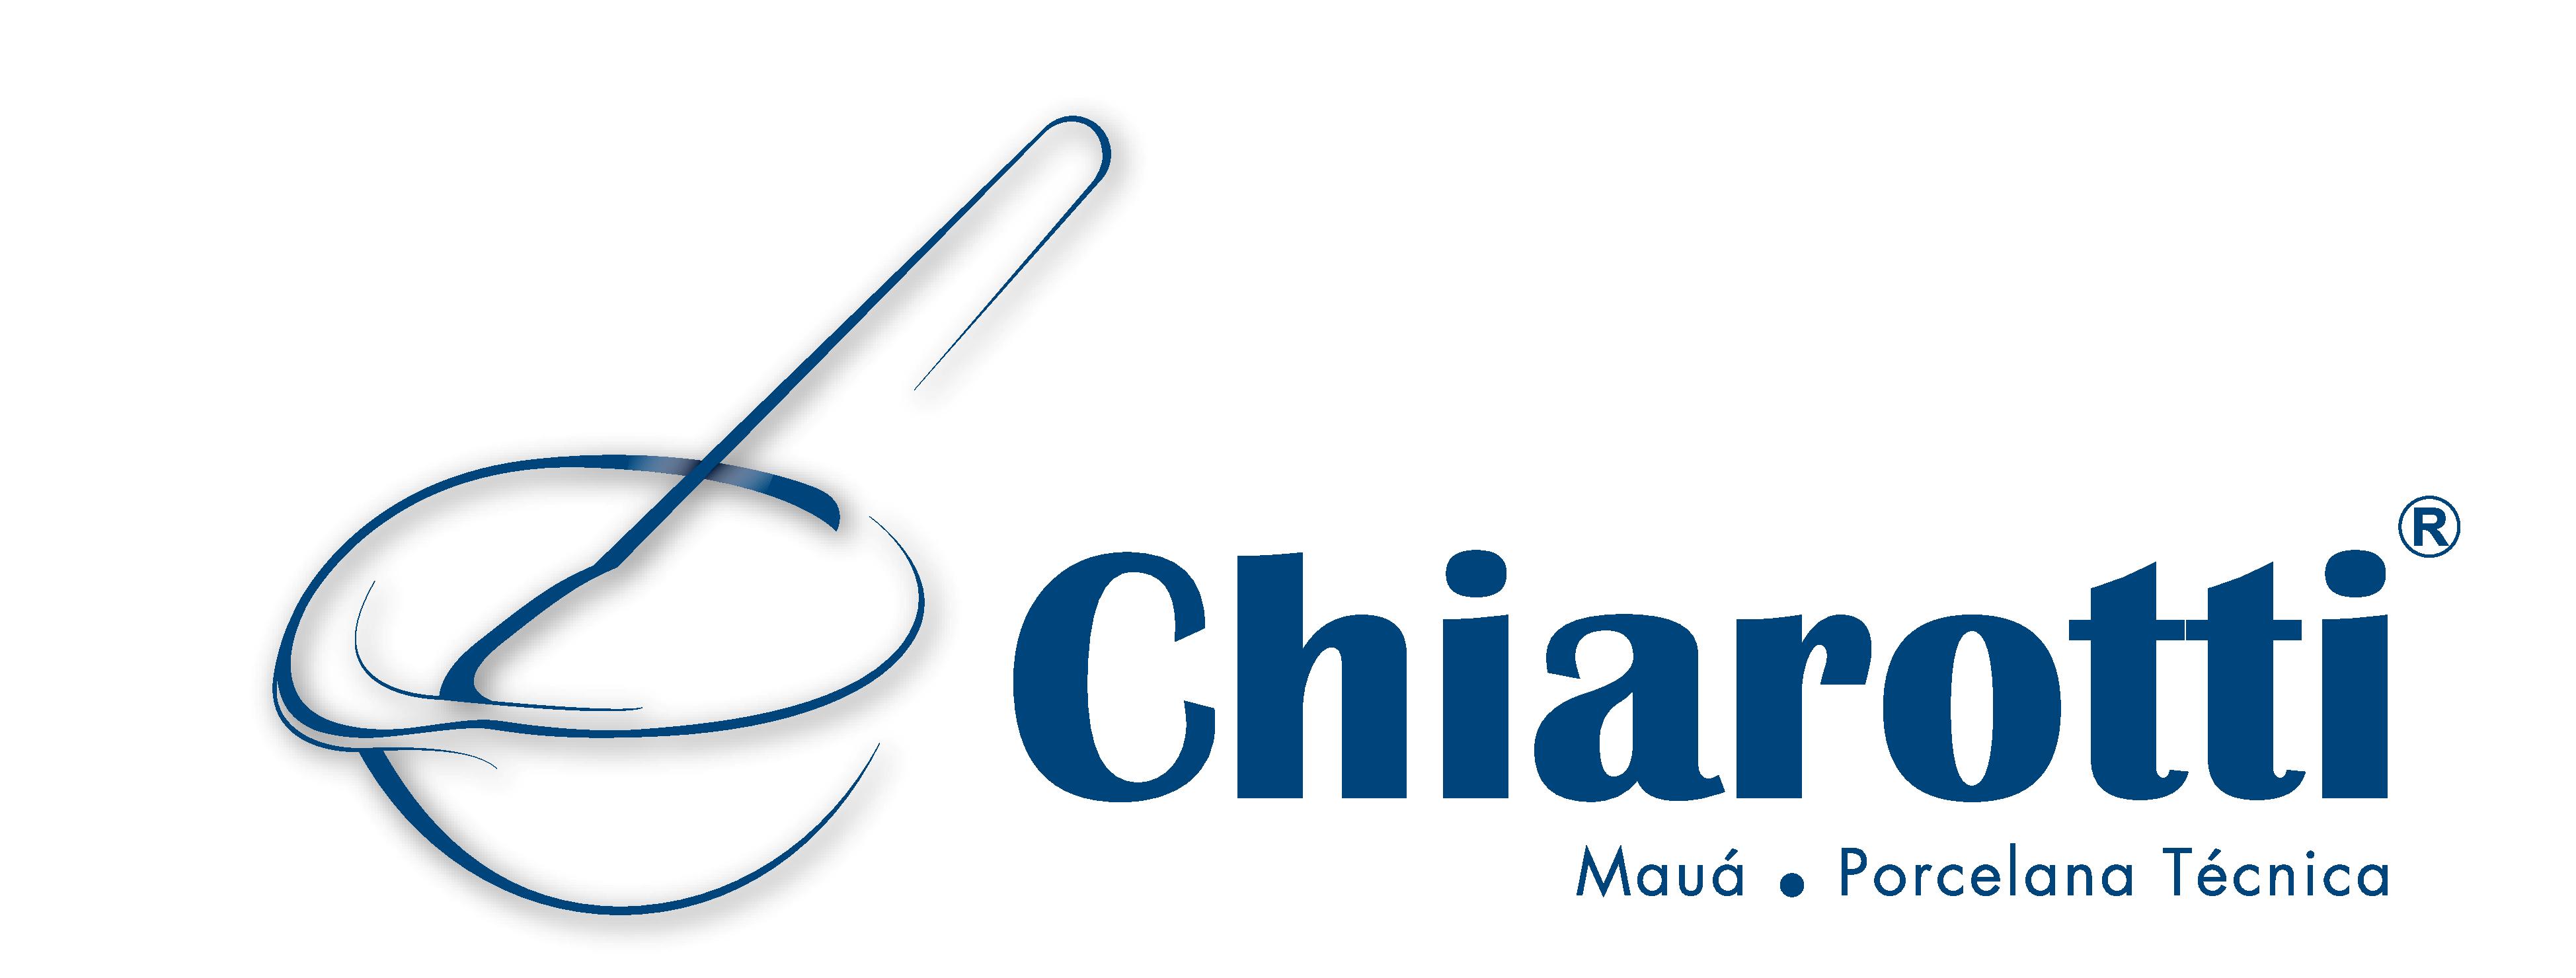 Chiarotti